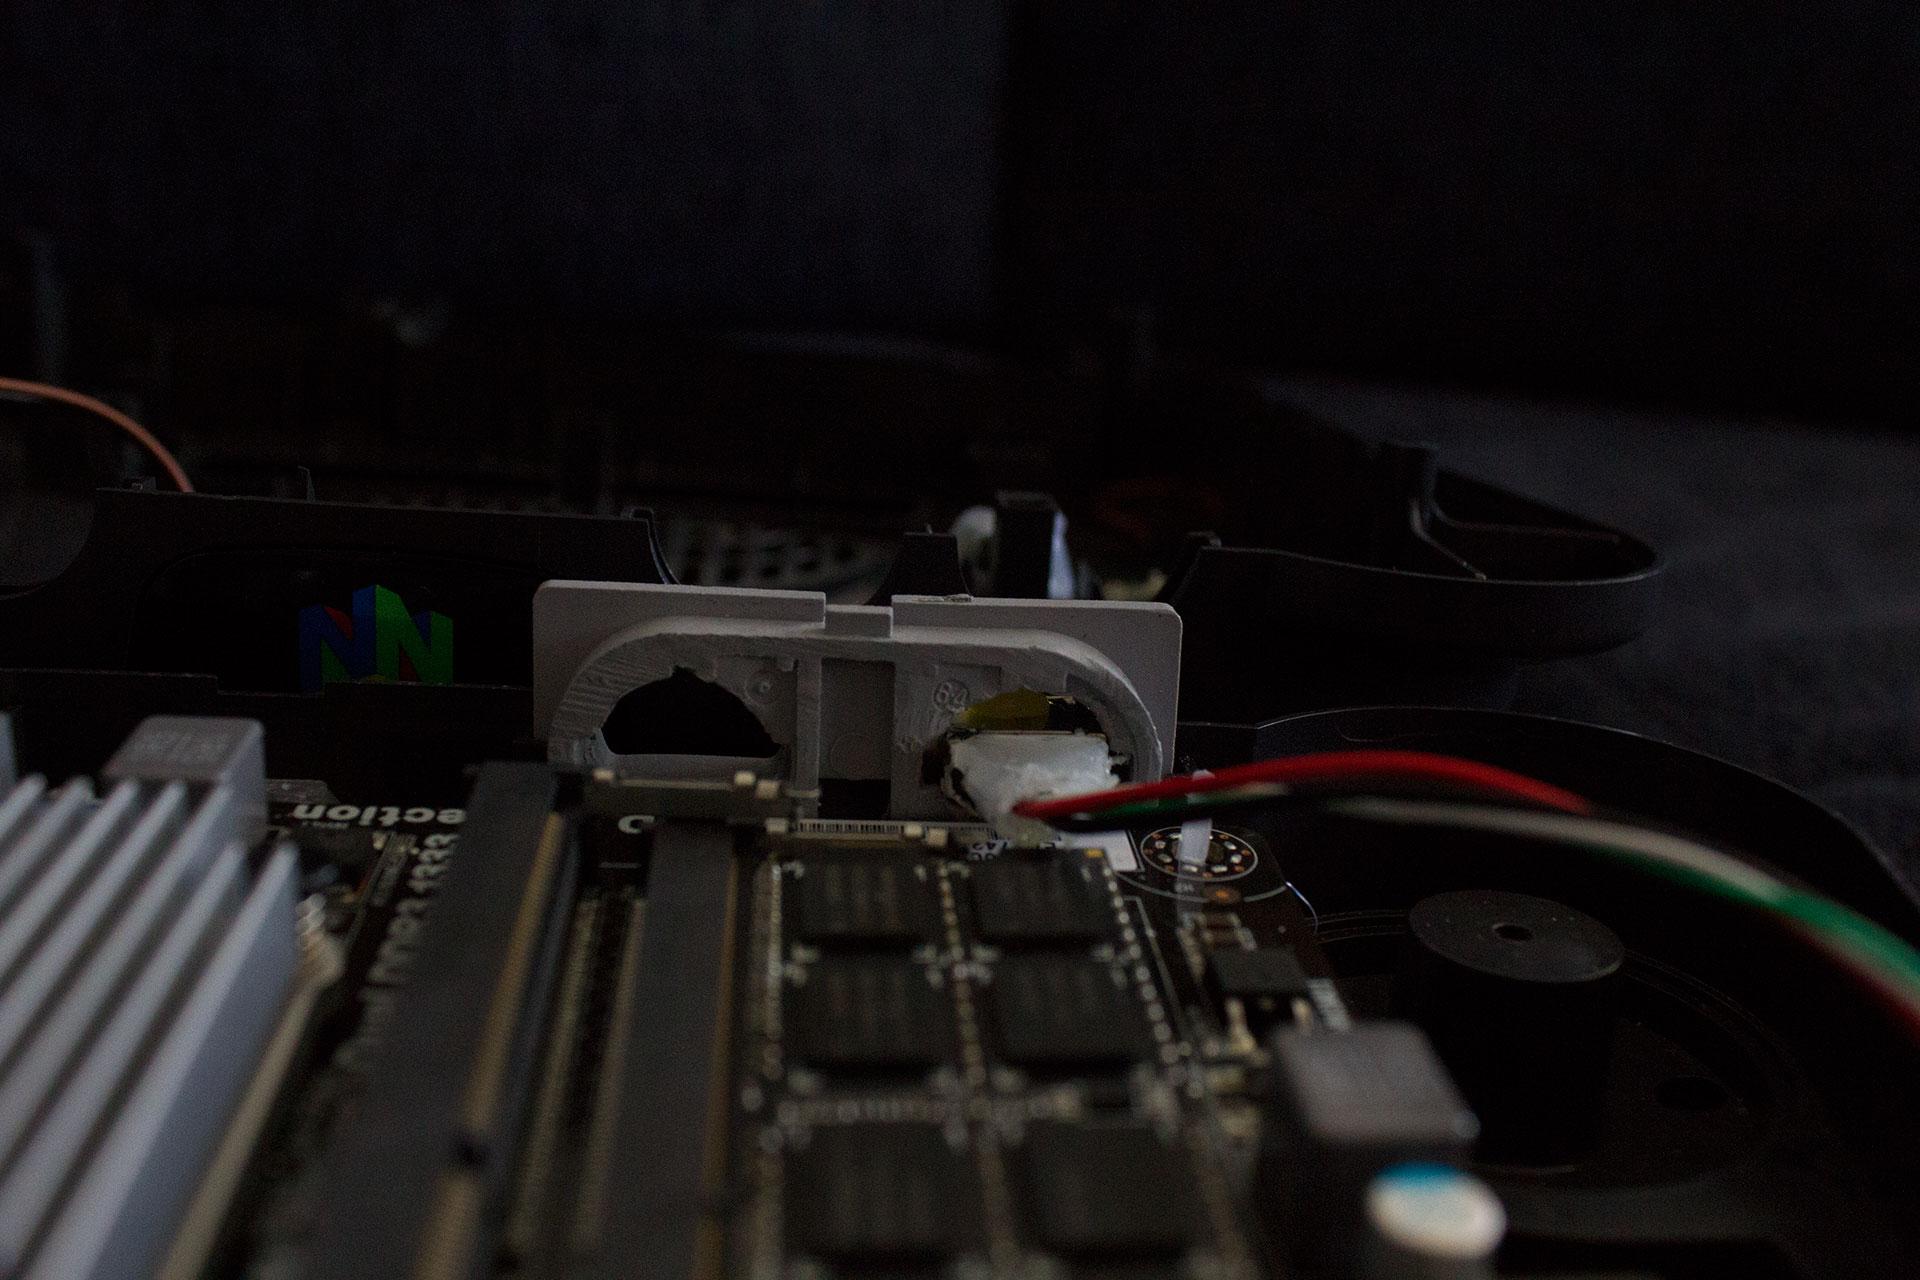 N64 USB port